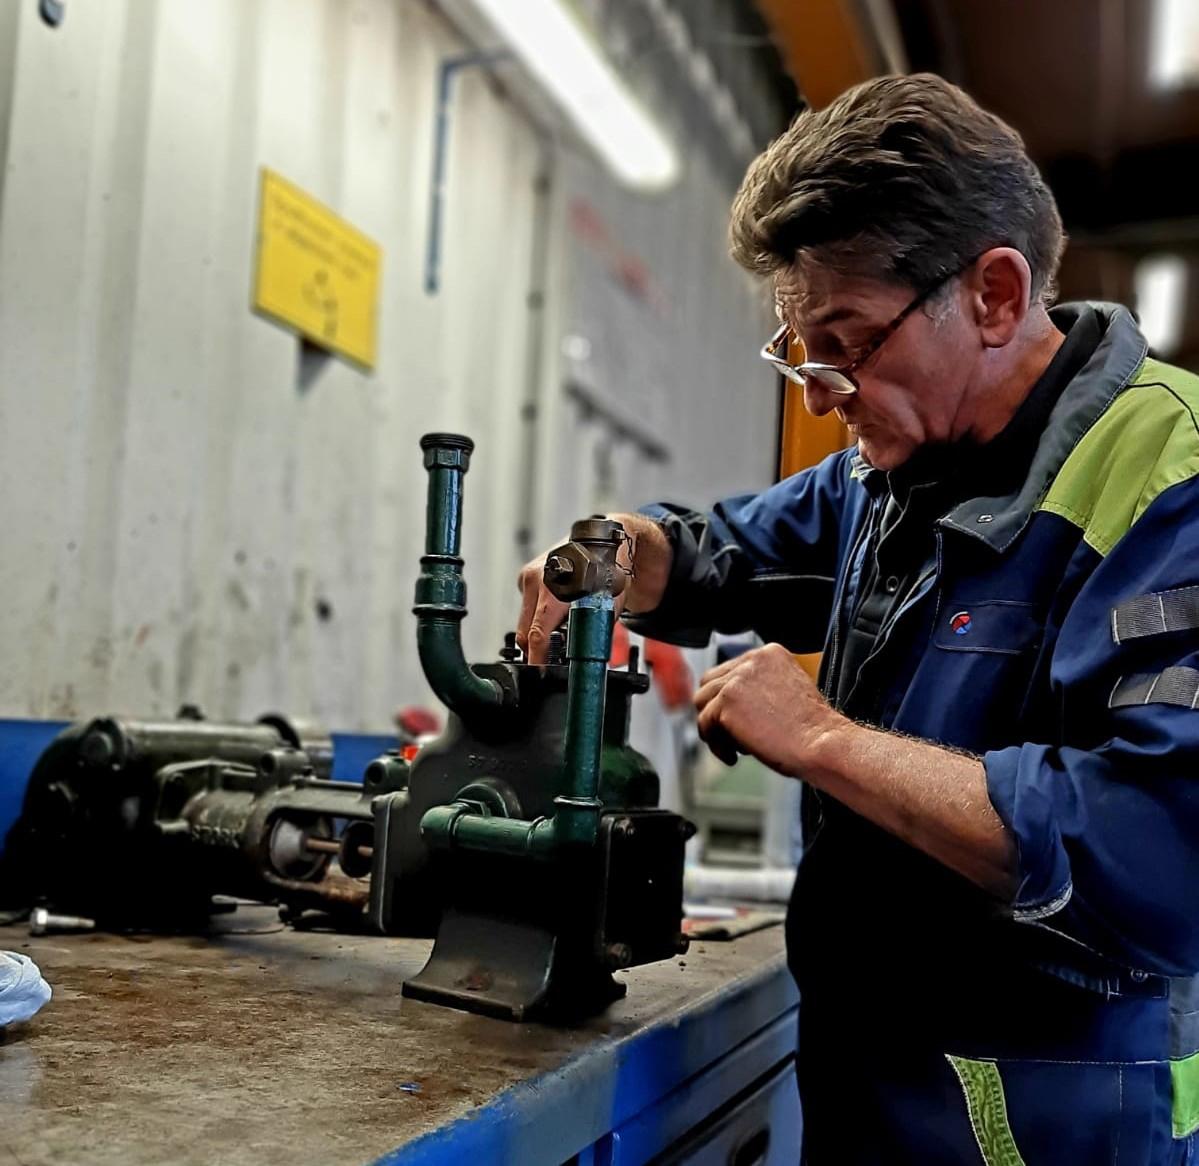 BBA Pumps pump service technician